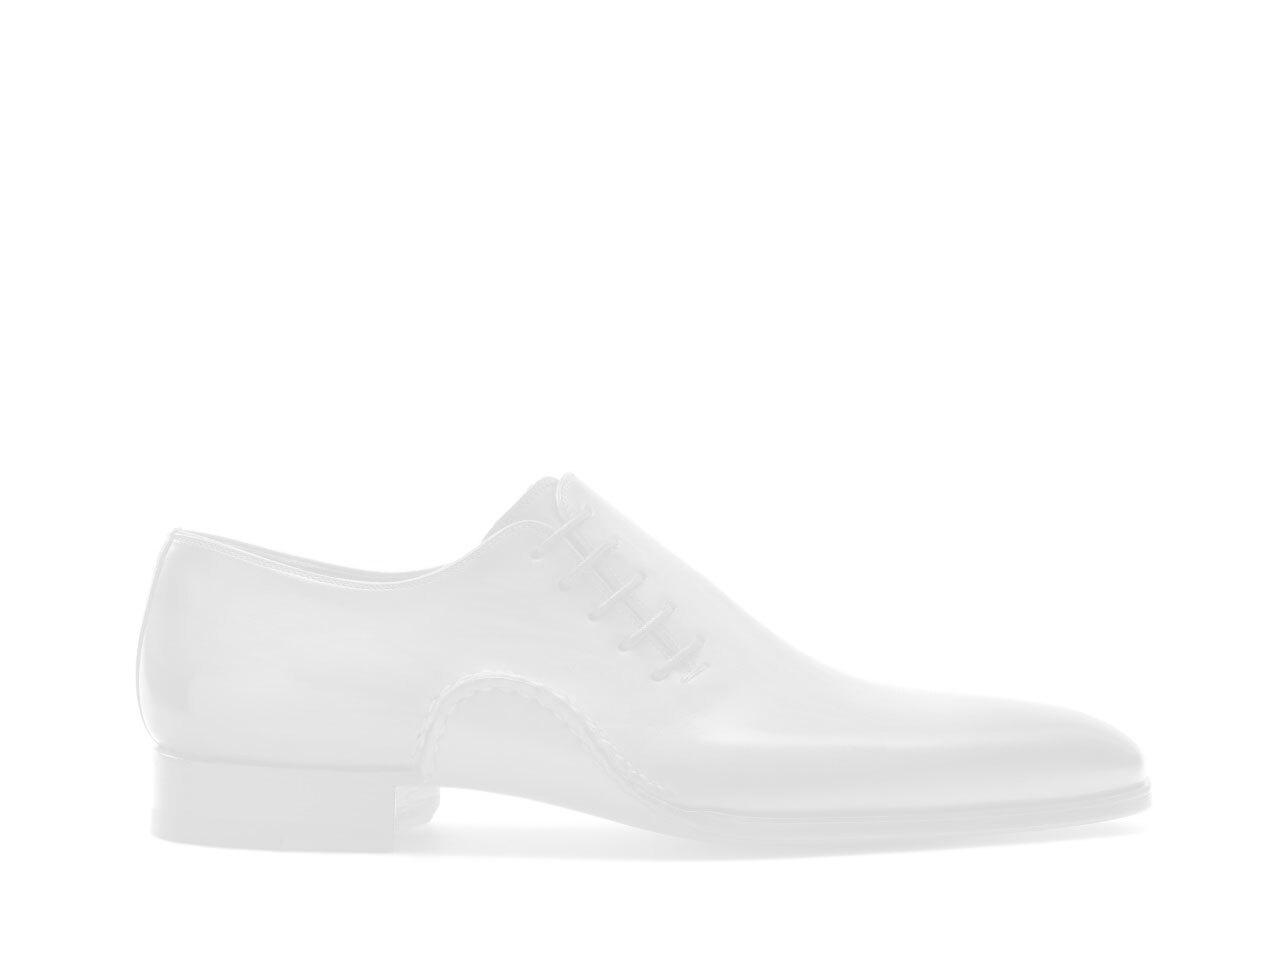 Pair of the Magnanni Ibiza Midbrown Men's Sneakers